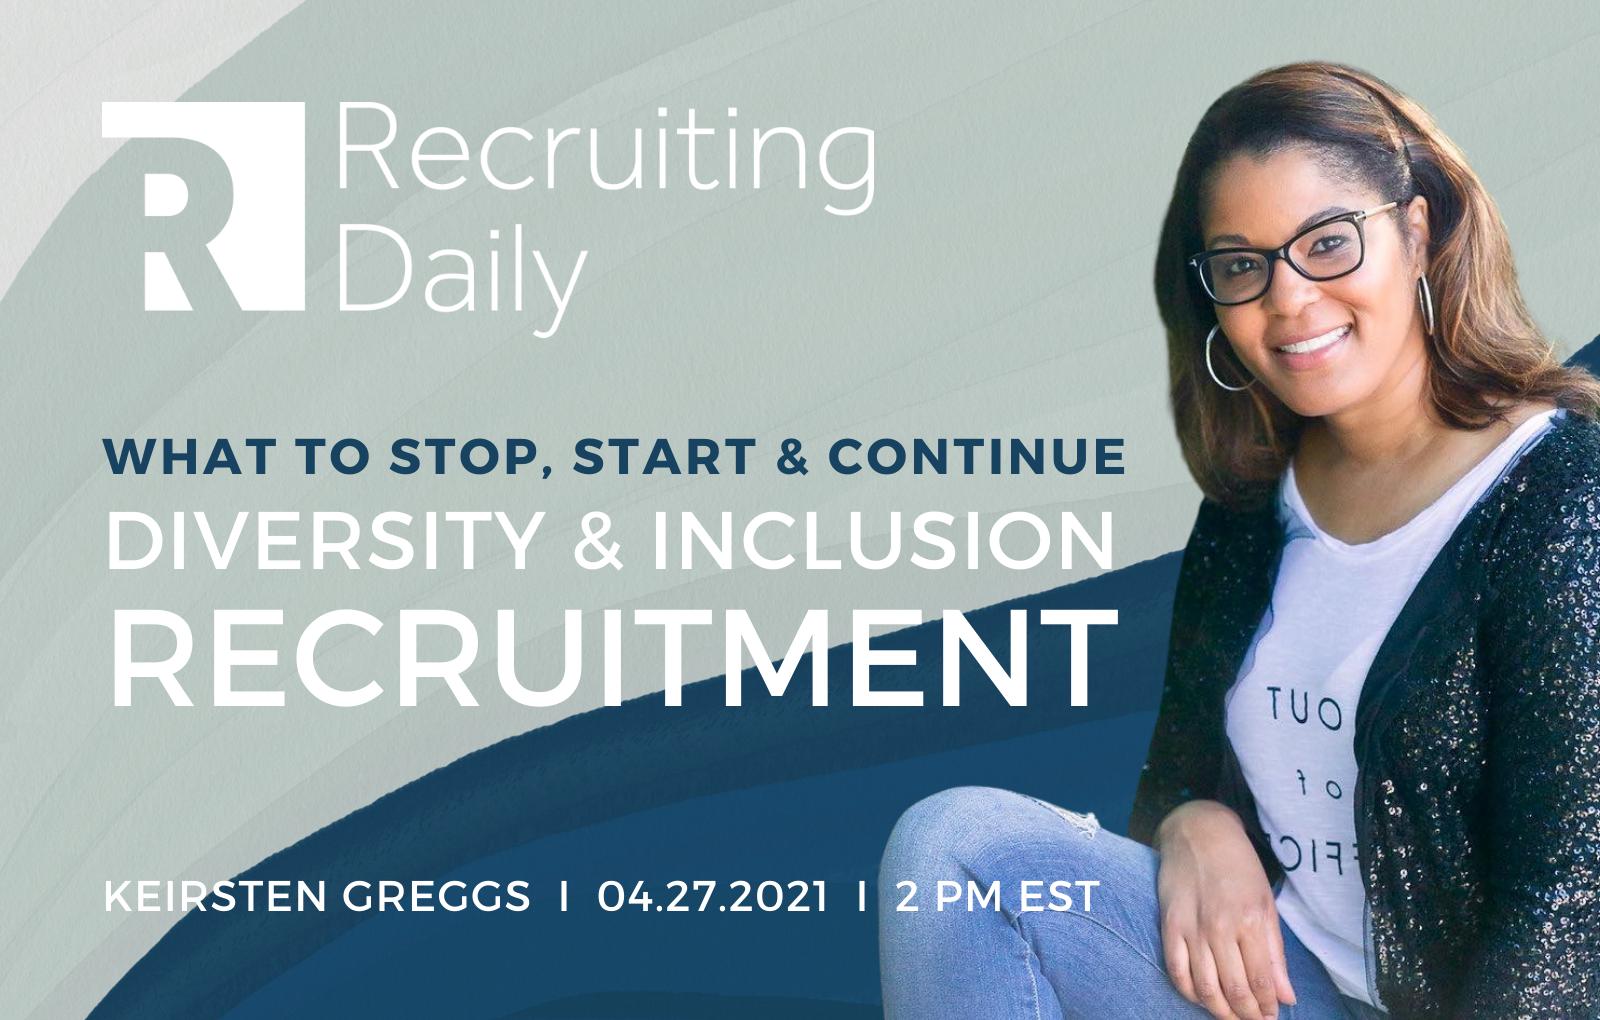 D&I Recruitment, Keirsten Greggs